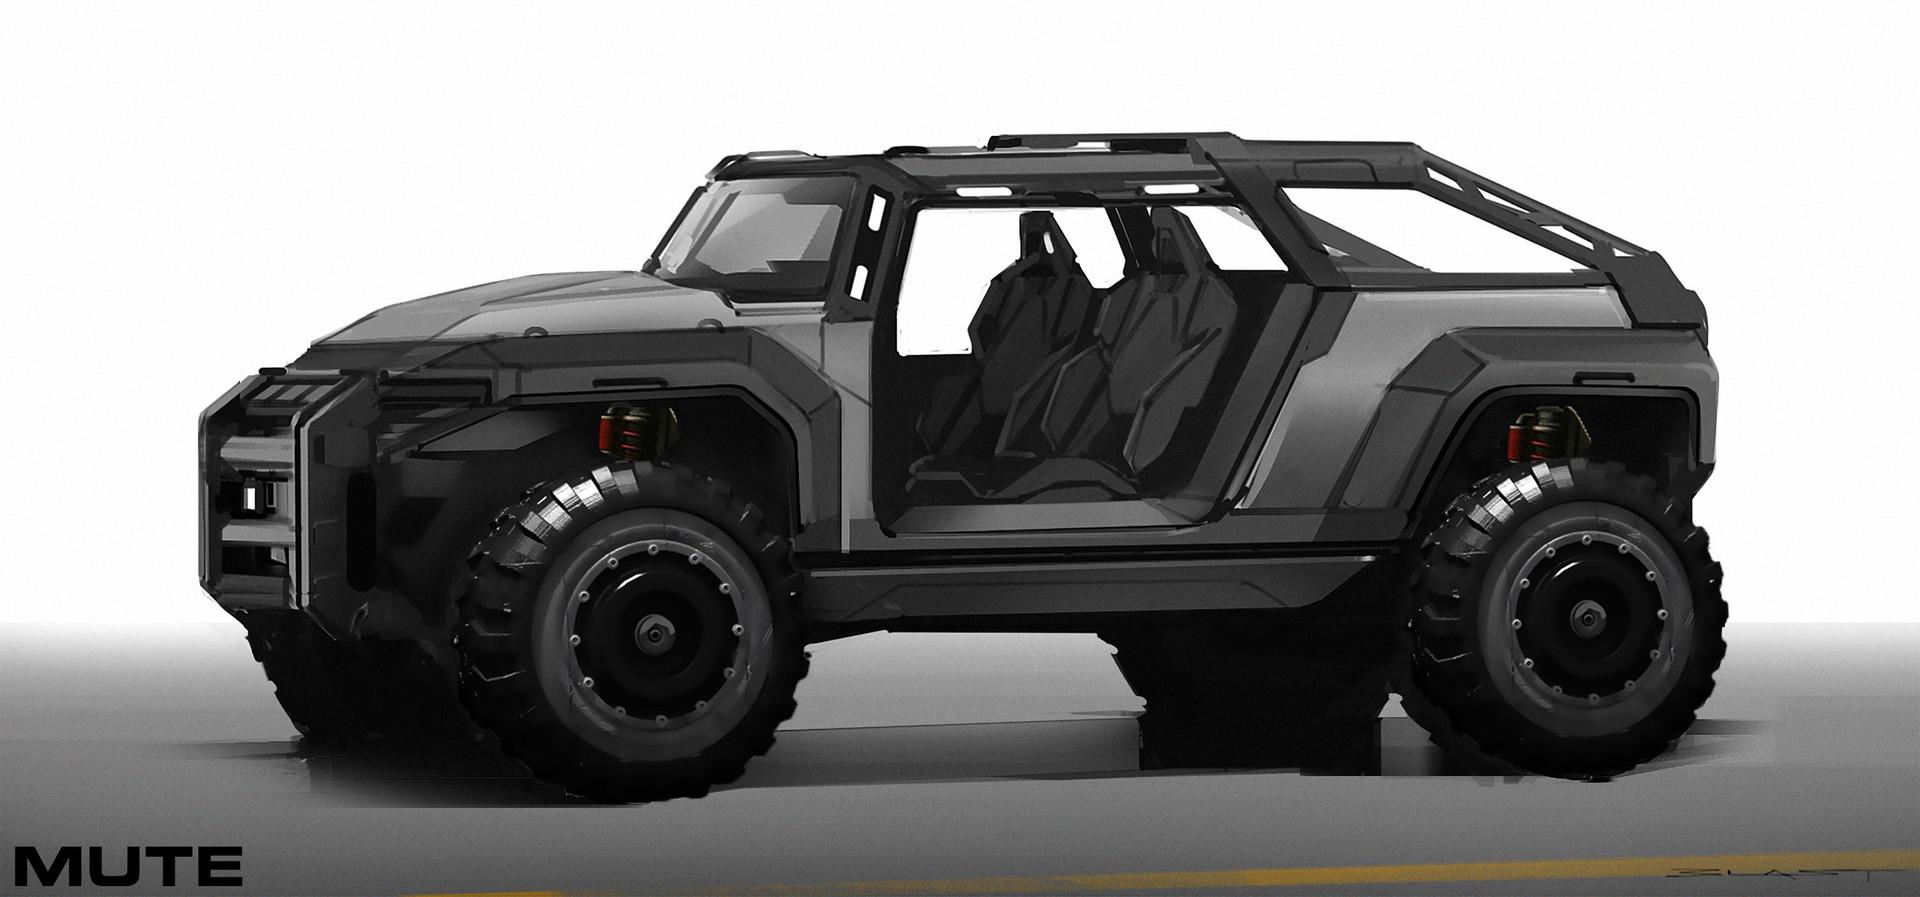 Benjamin last mute jeep sketch4 blast